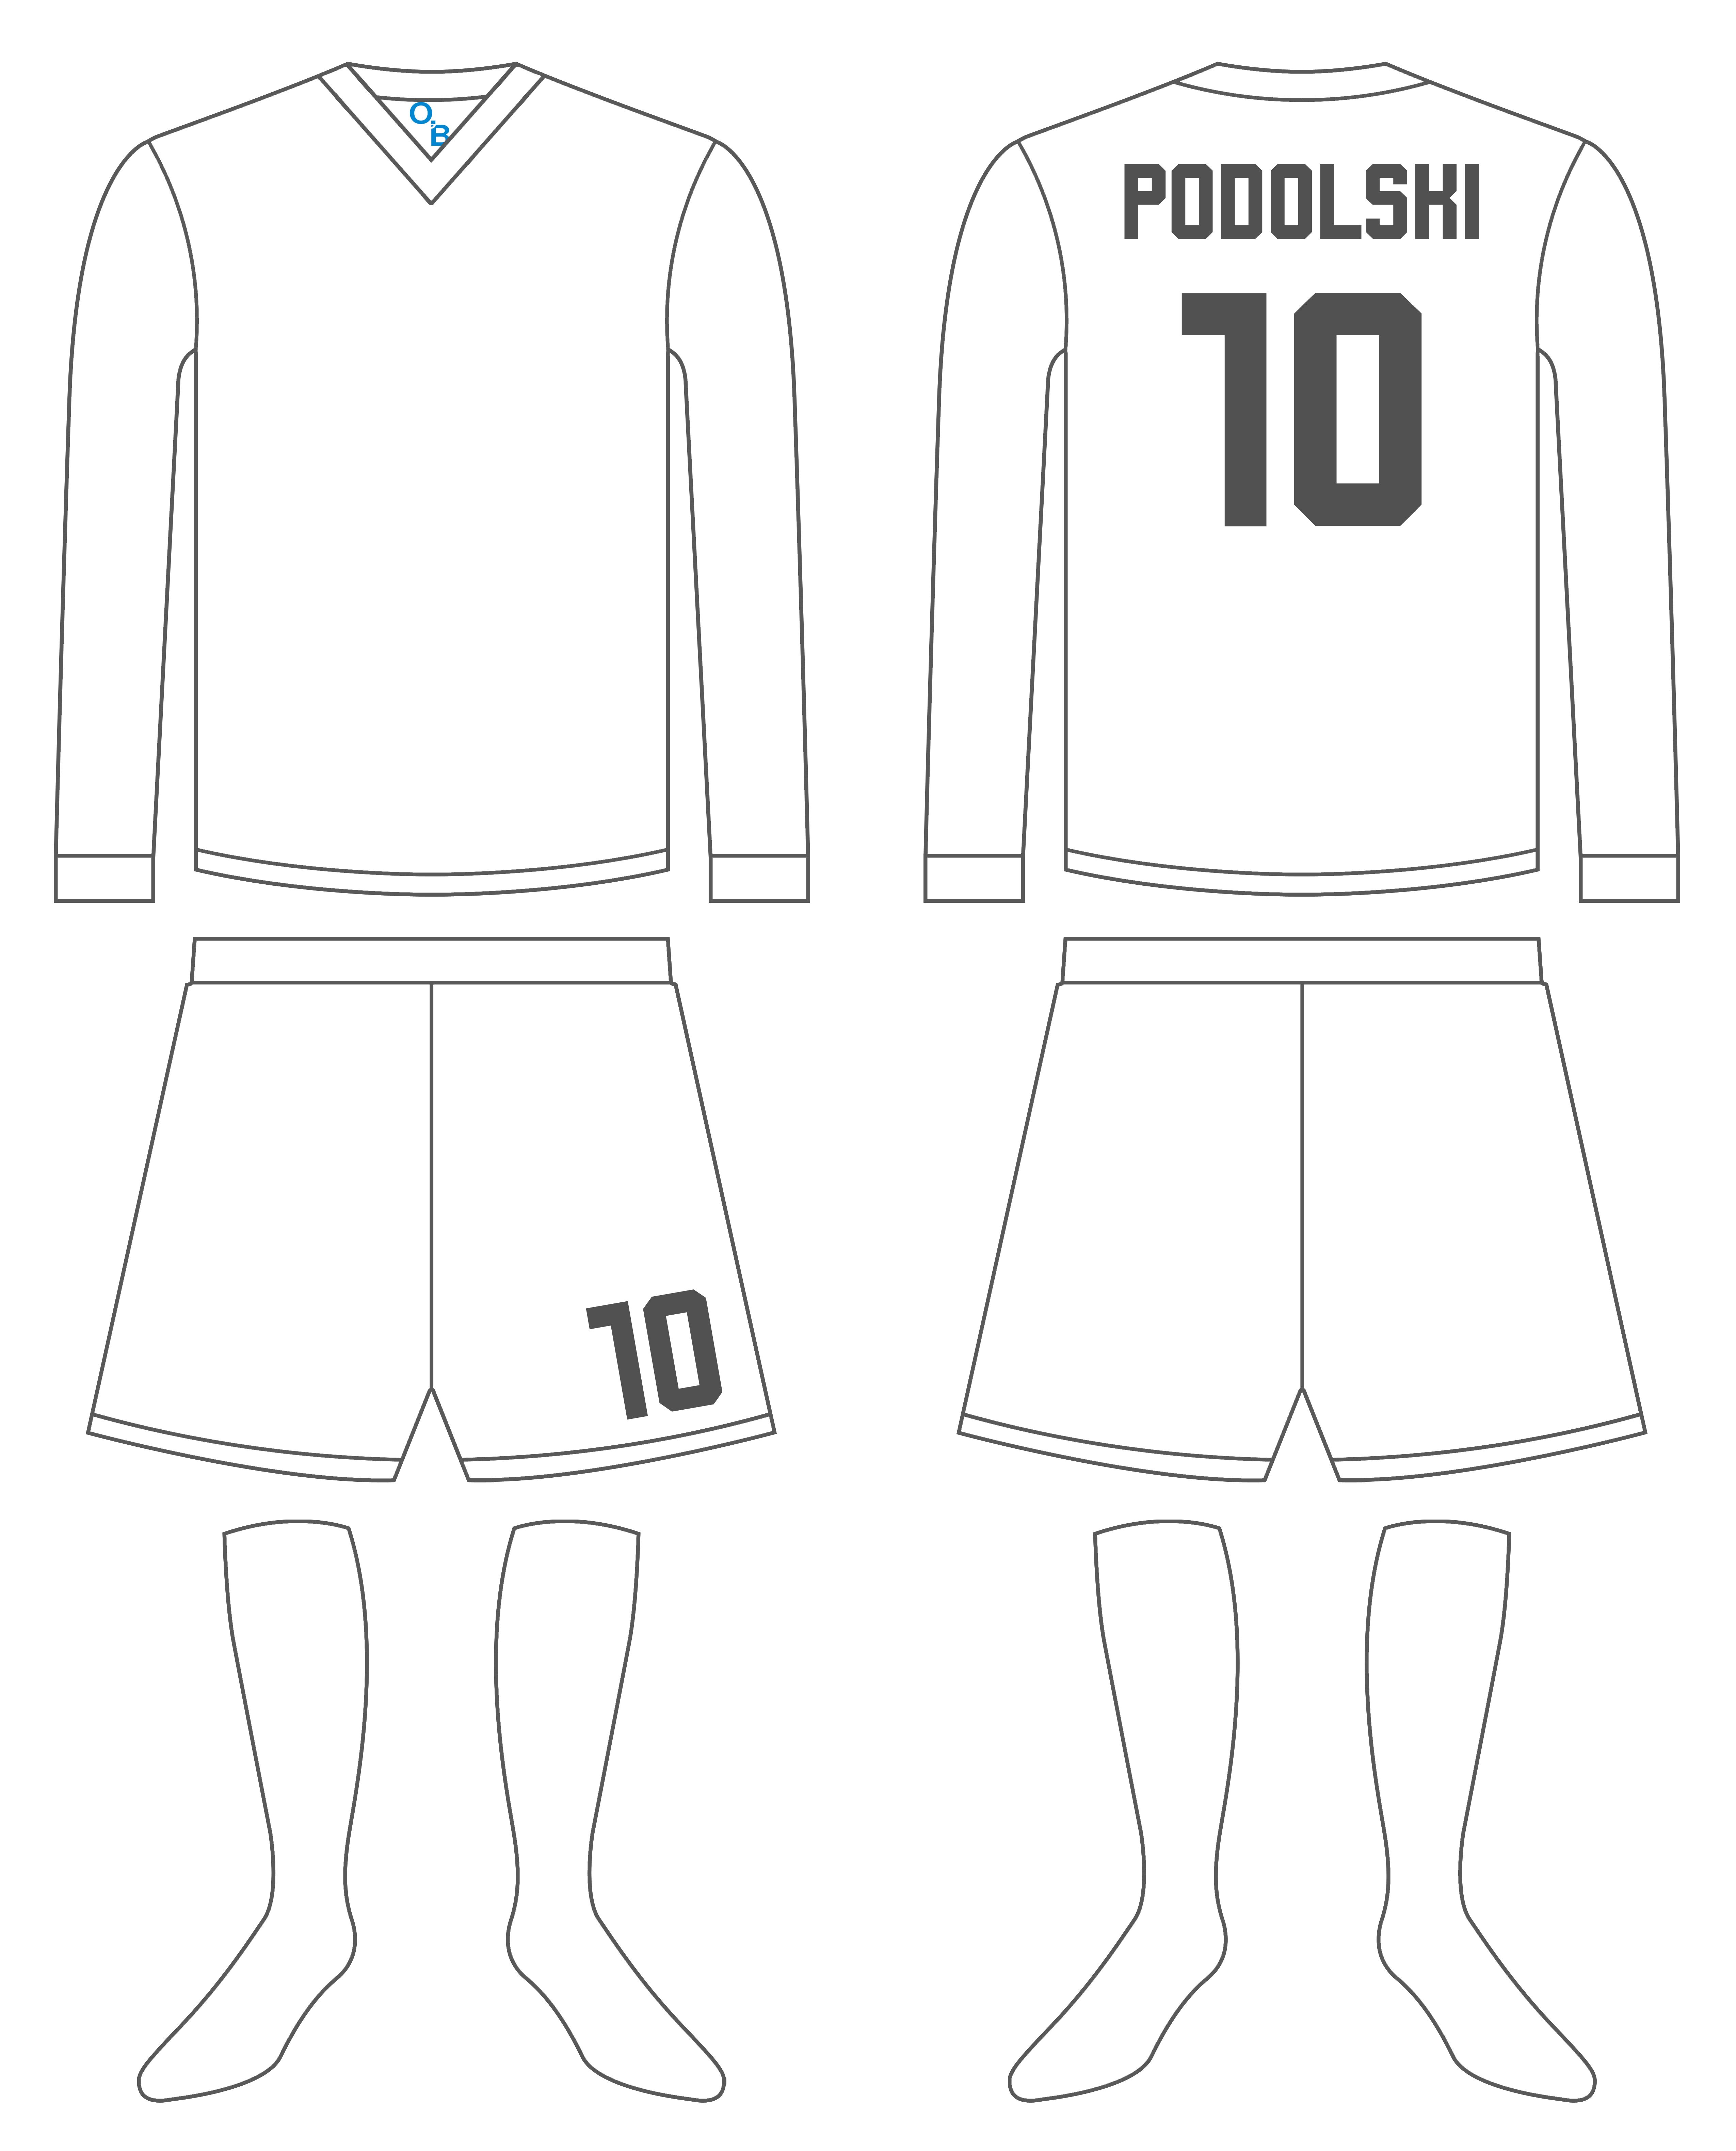 Soccer Kit Template 2 By Timeobrienviantart On Deviantart